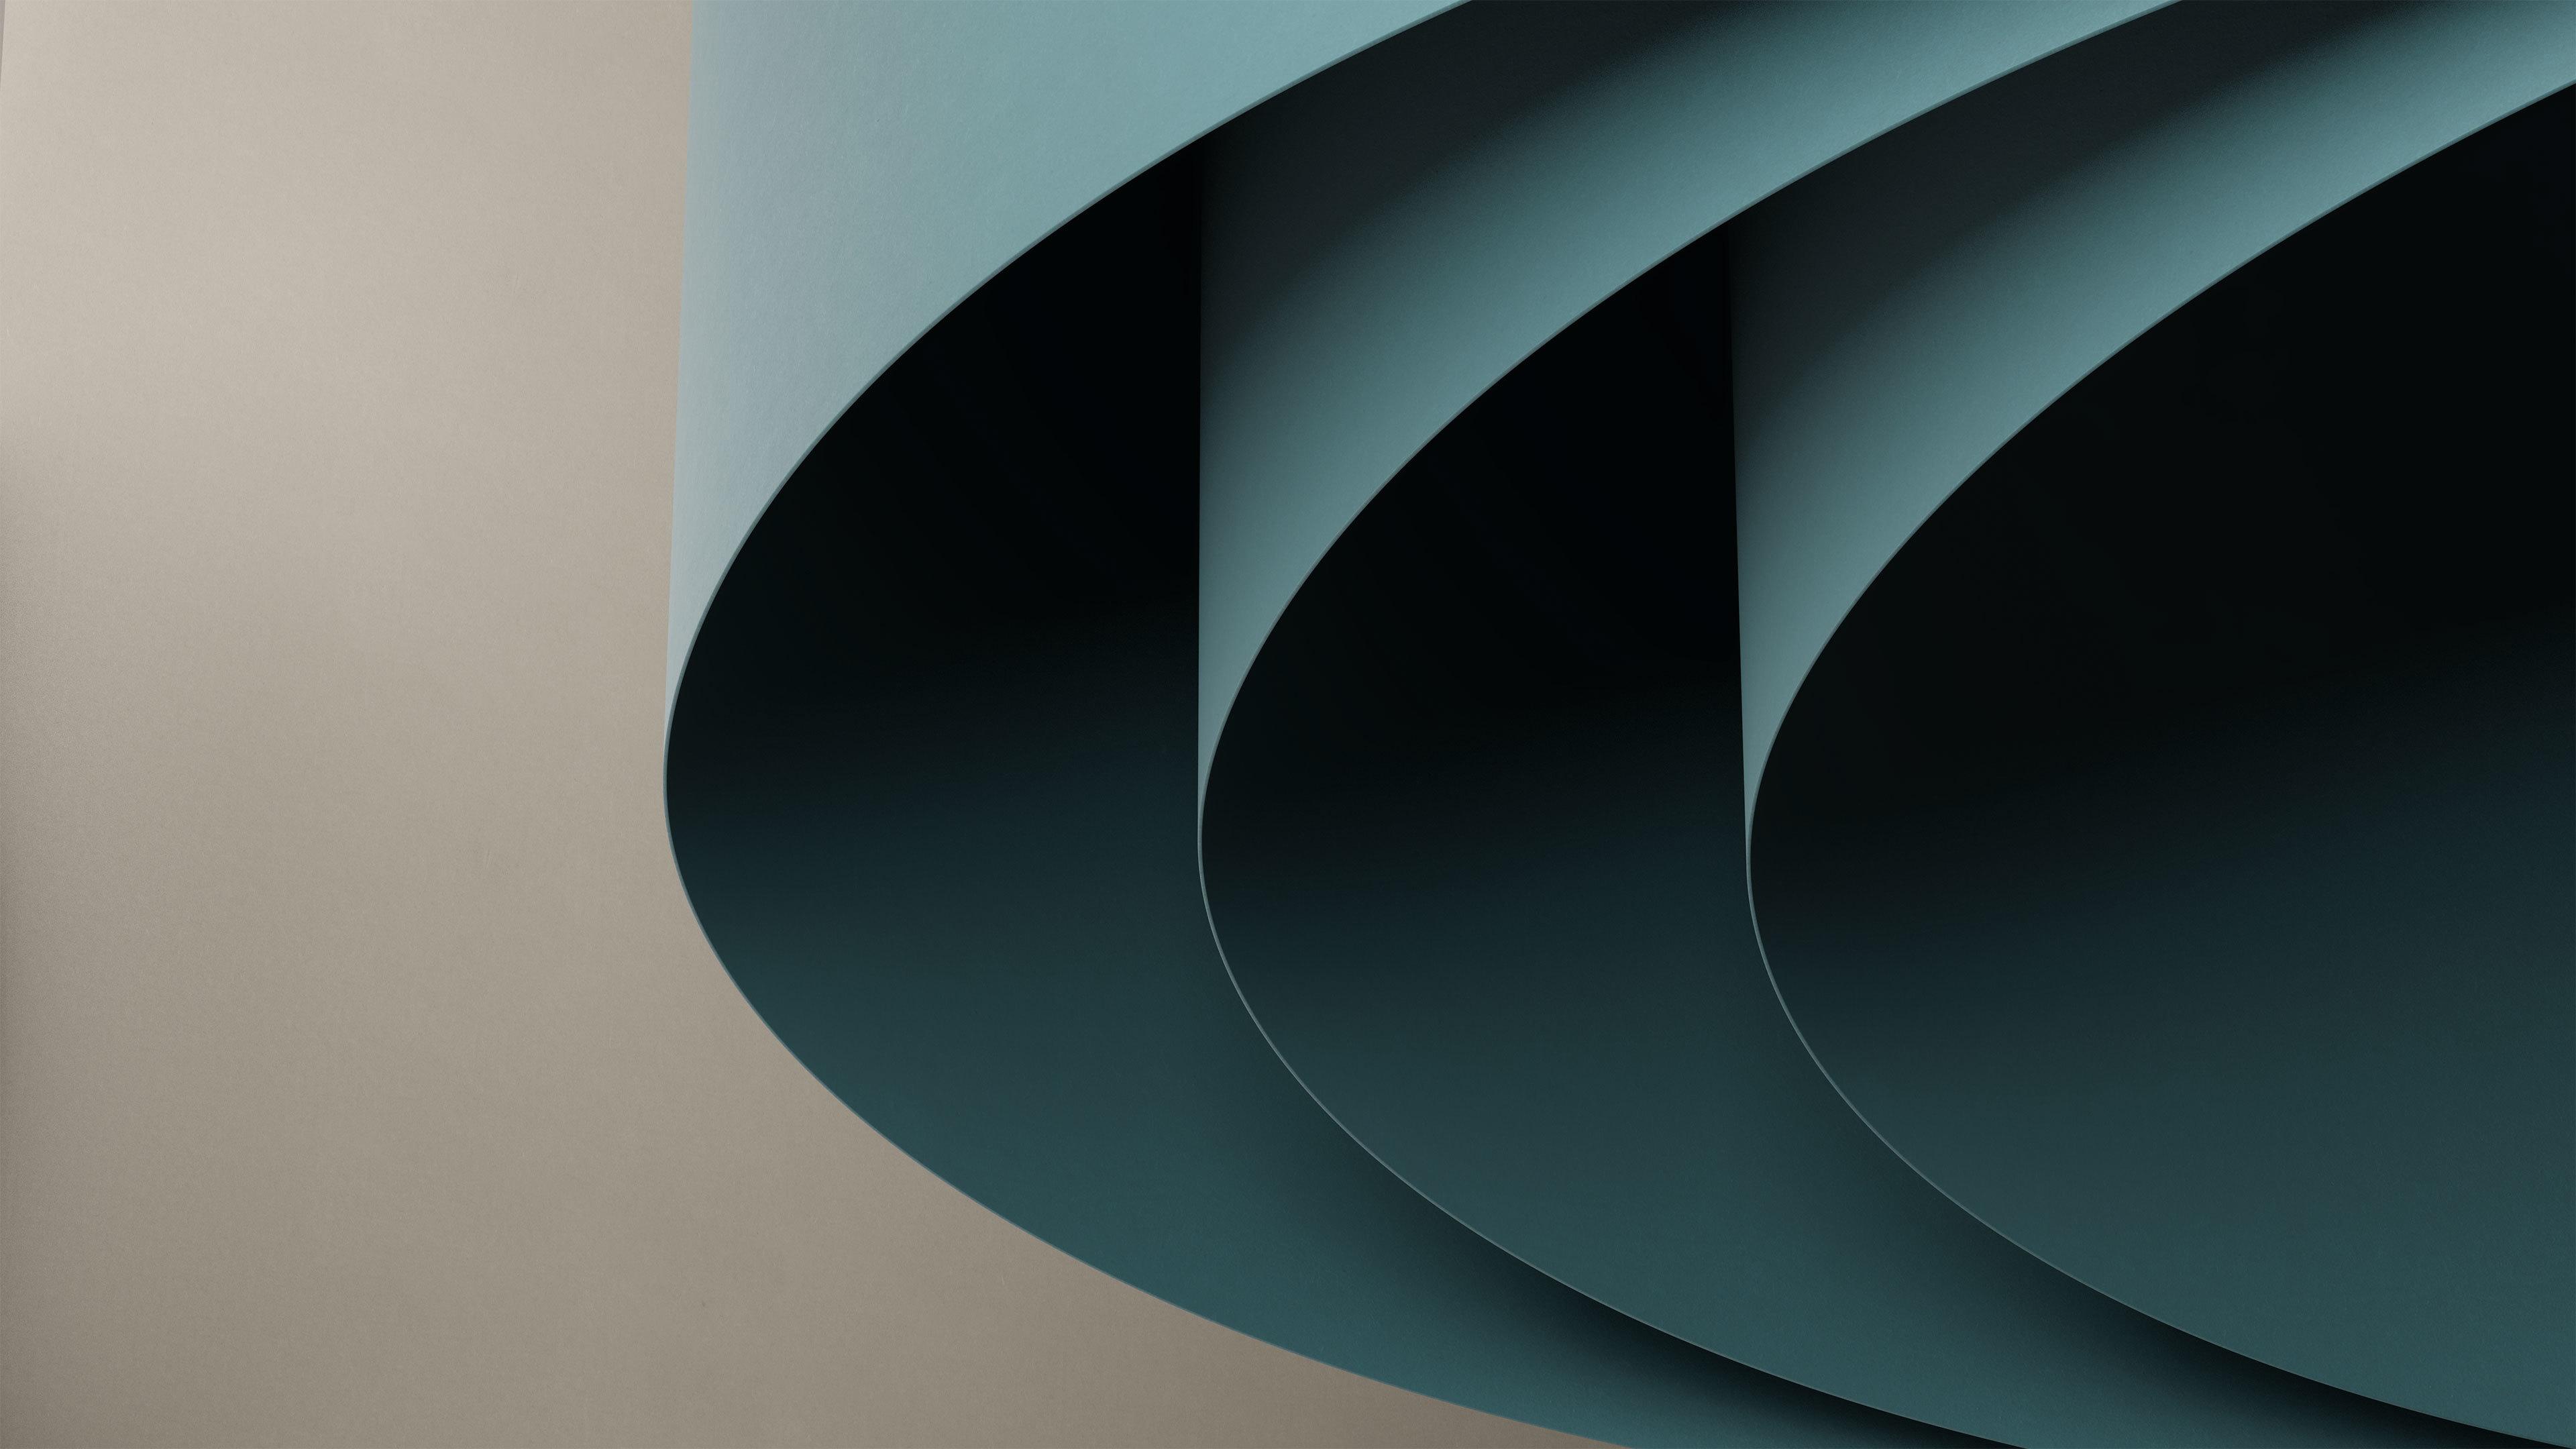 Landscape debrauw paper blackstone duo high res 1